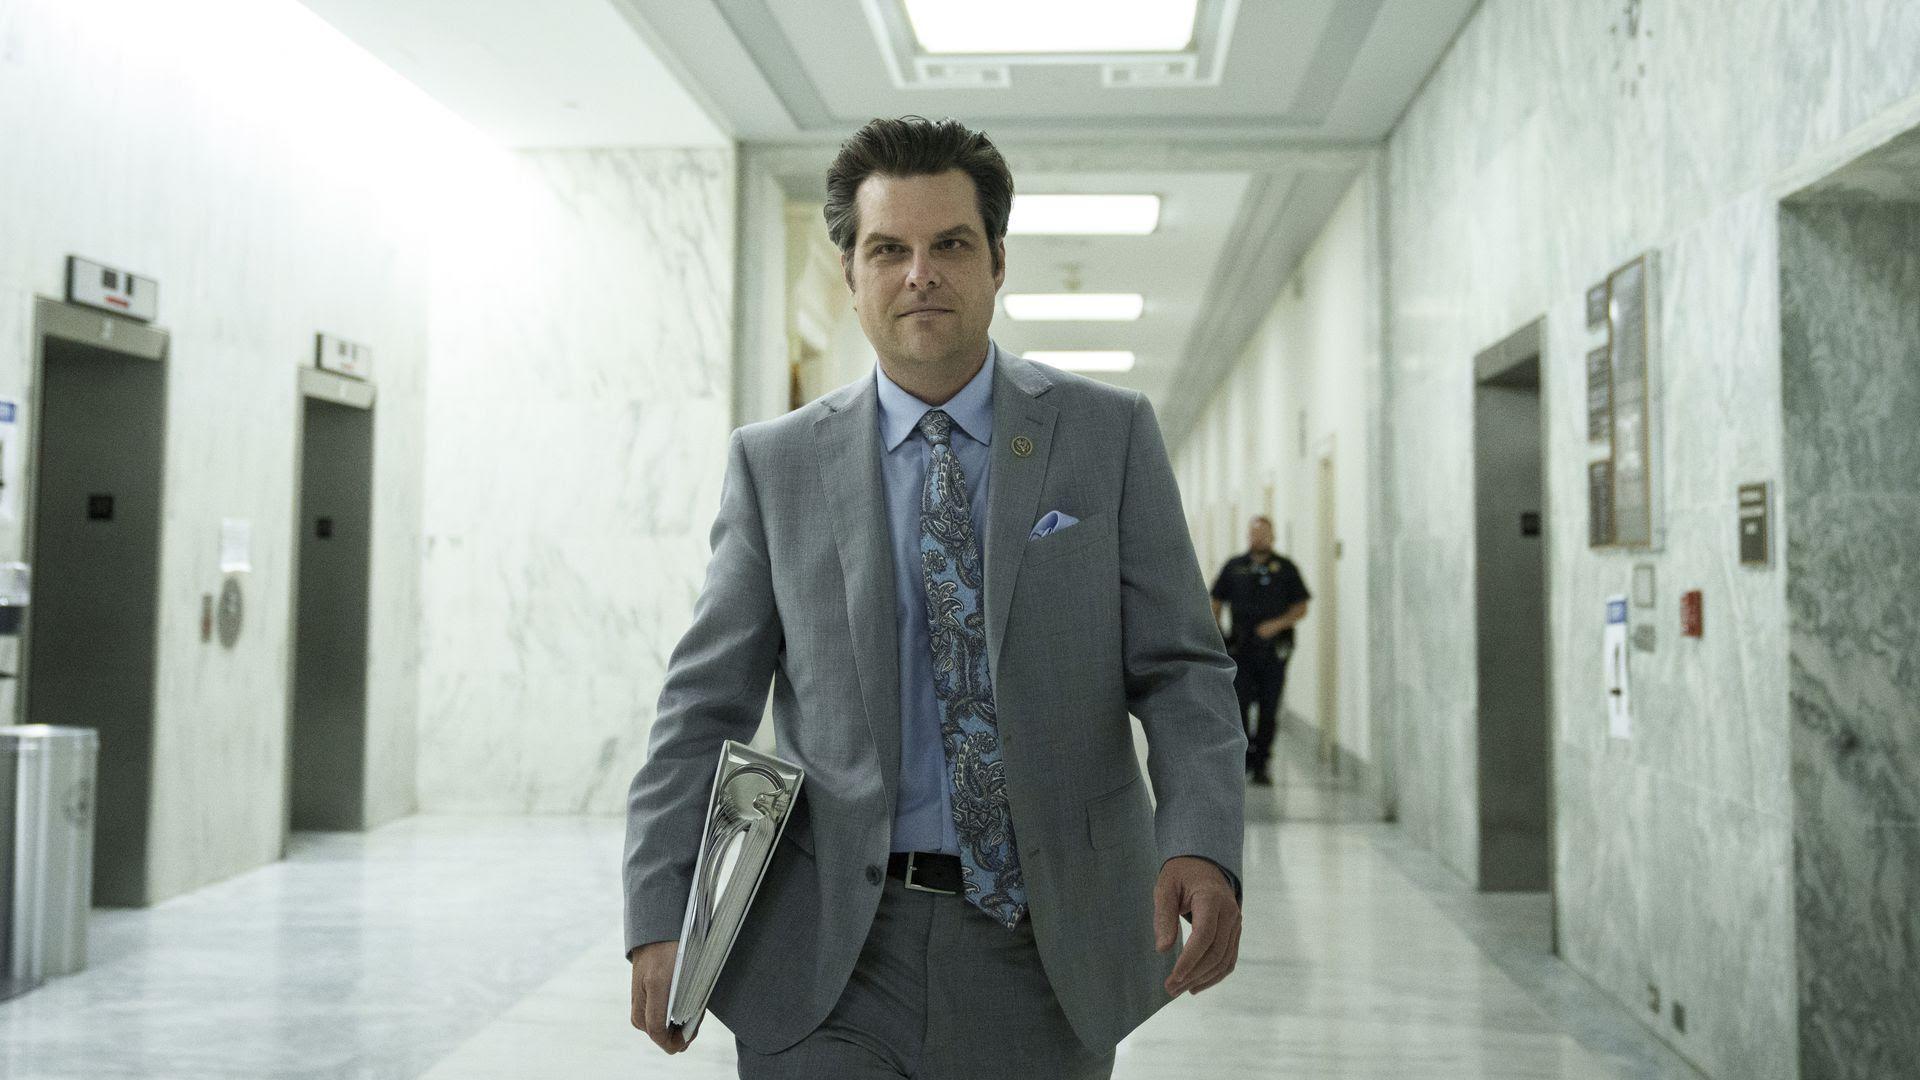 Matt Gaetz walks through a hallway on Capitol Hill with a binder in one hand.